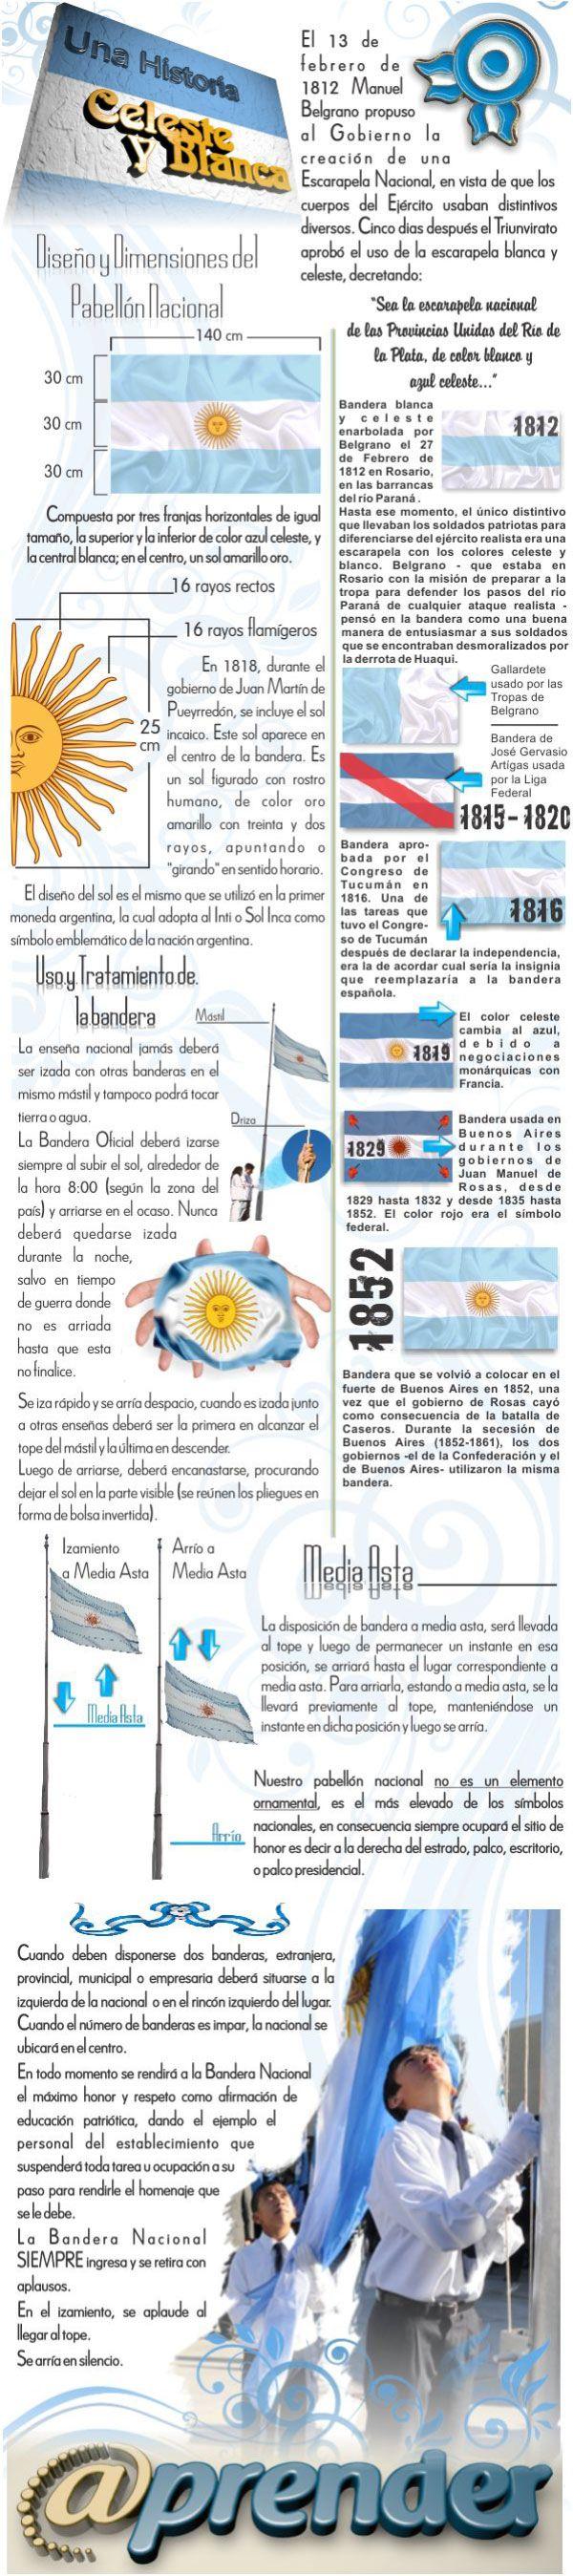 Historia de la Bandera Argentina (INFOGRAPHIC) - History of the Argentinian Flag